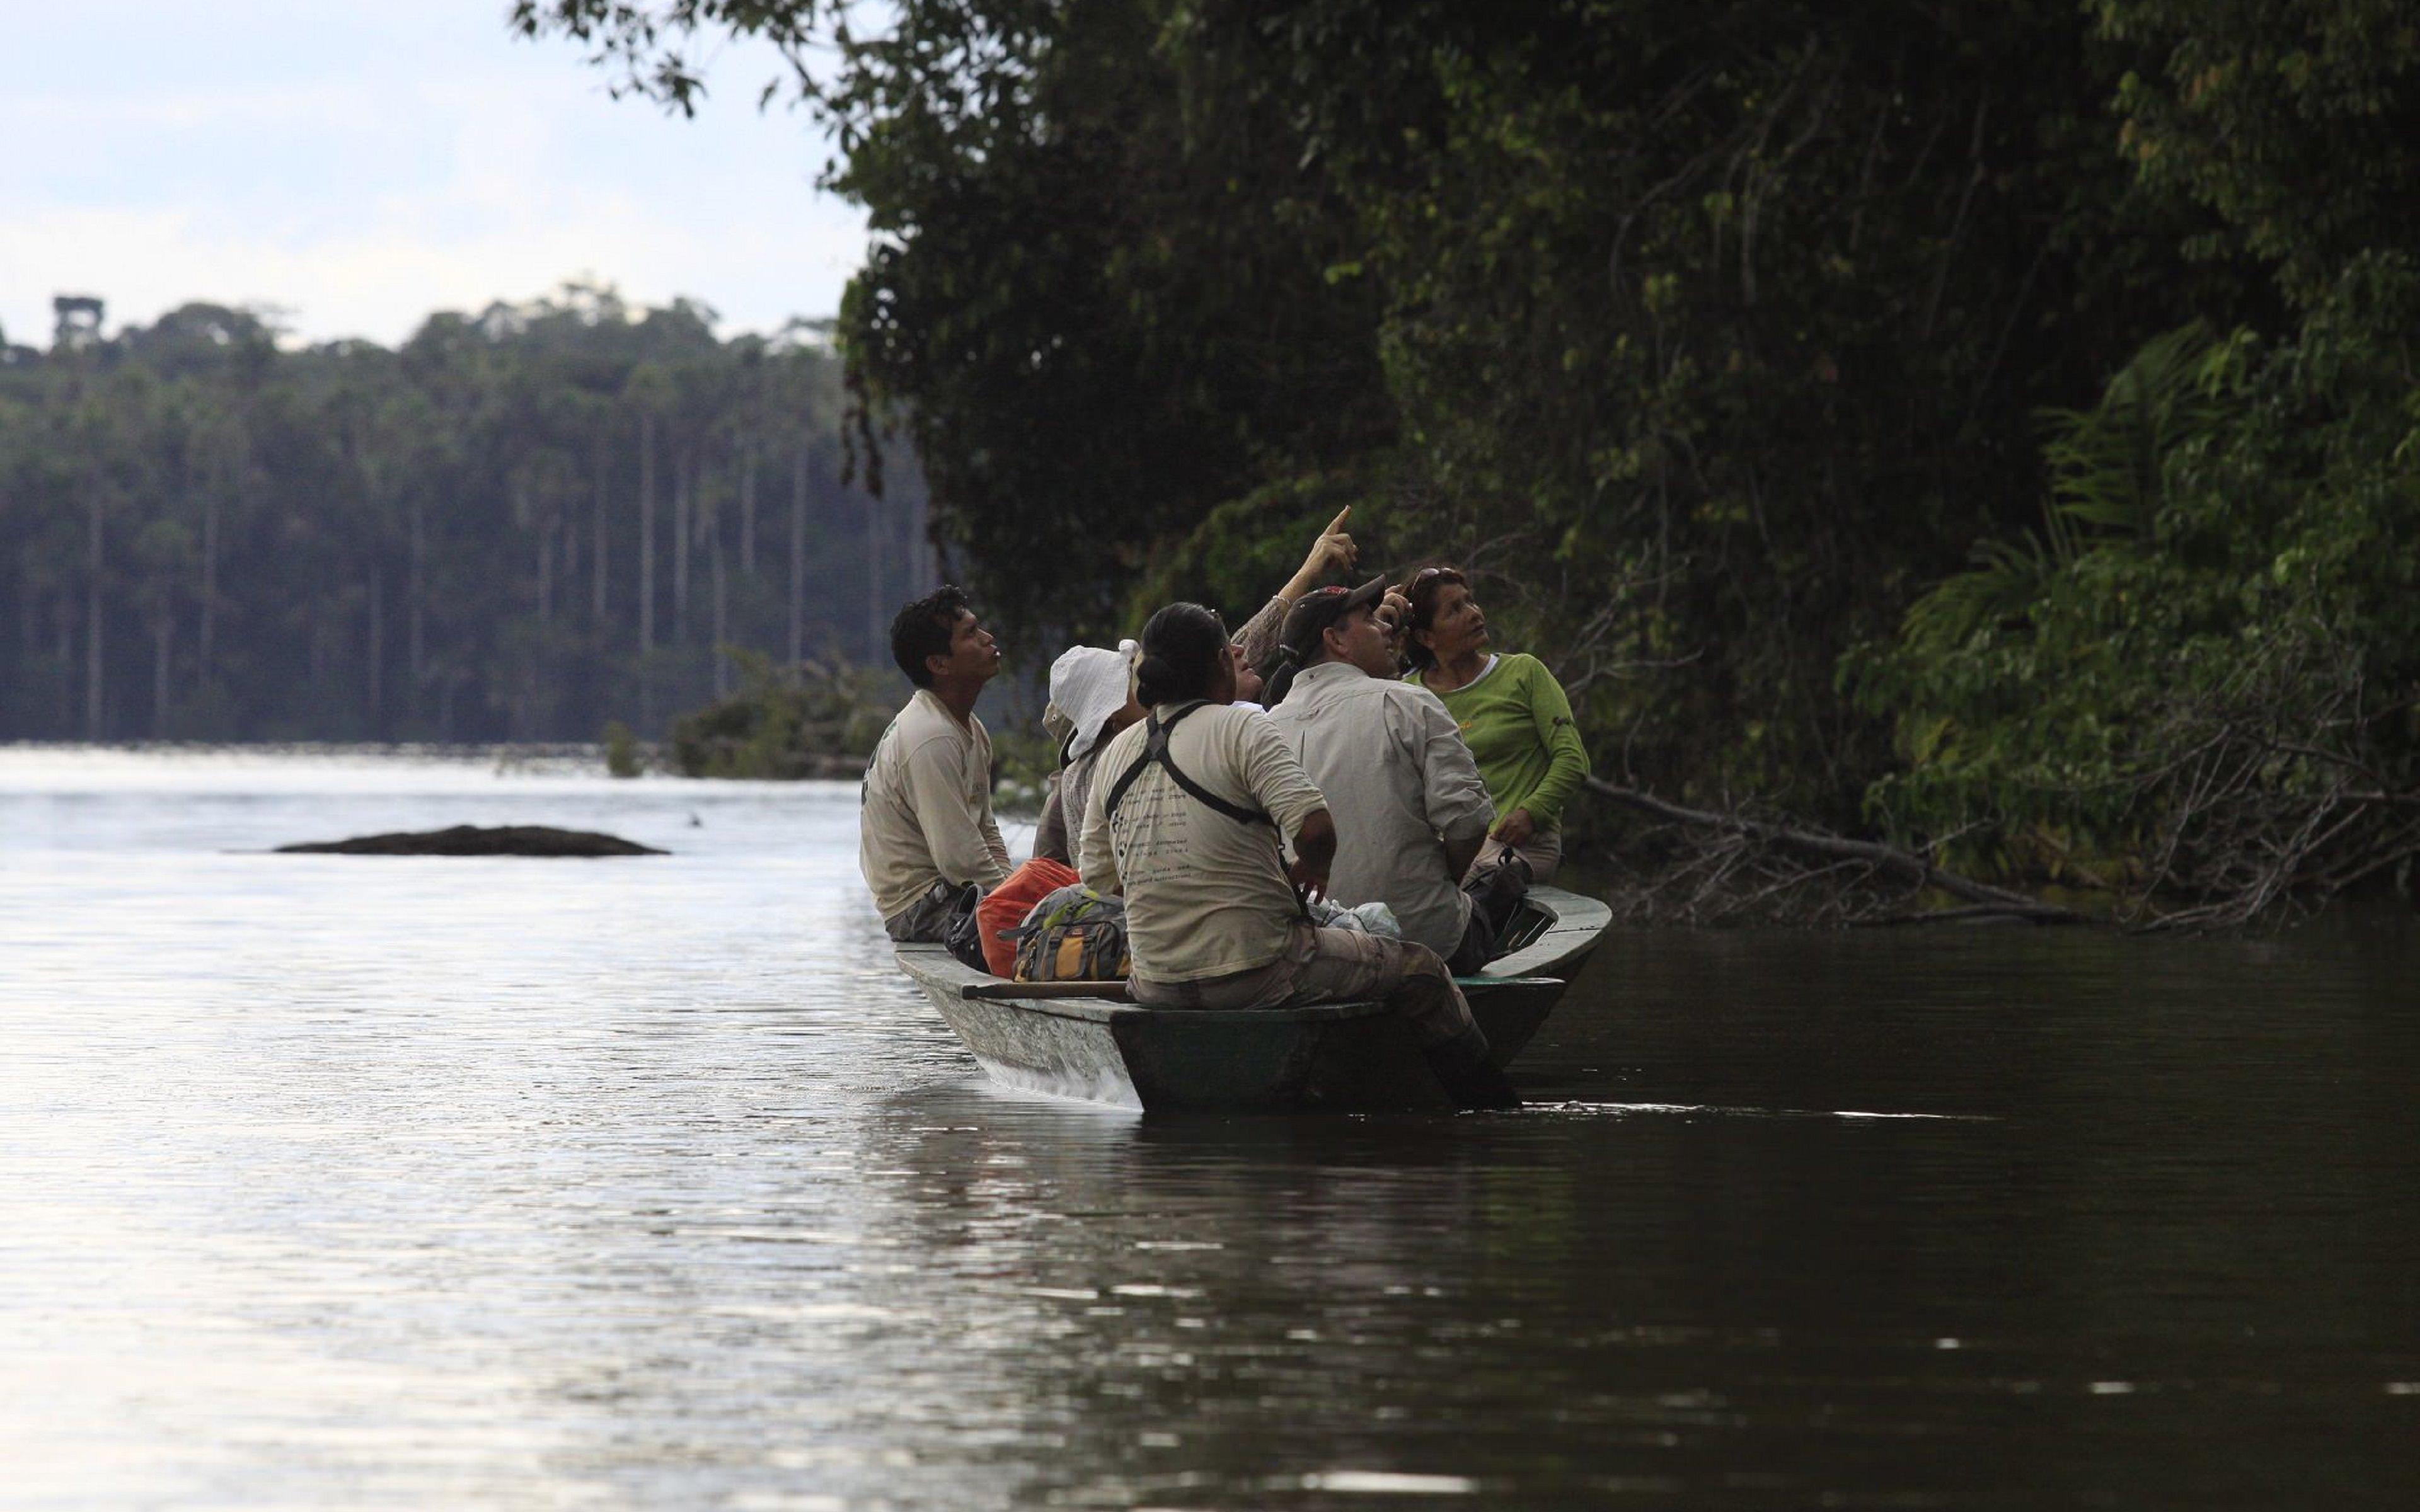 FEATURED TAMBOPATA - Tambopata National Reserve